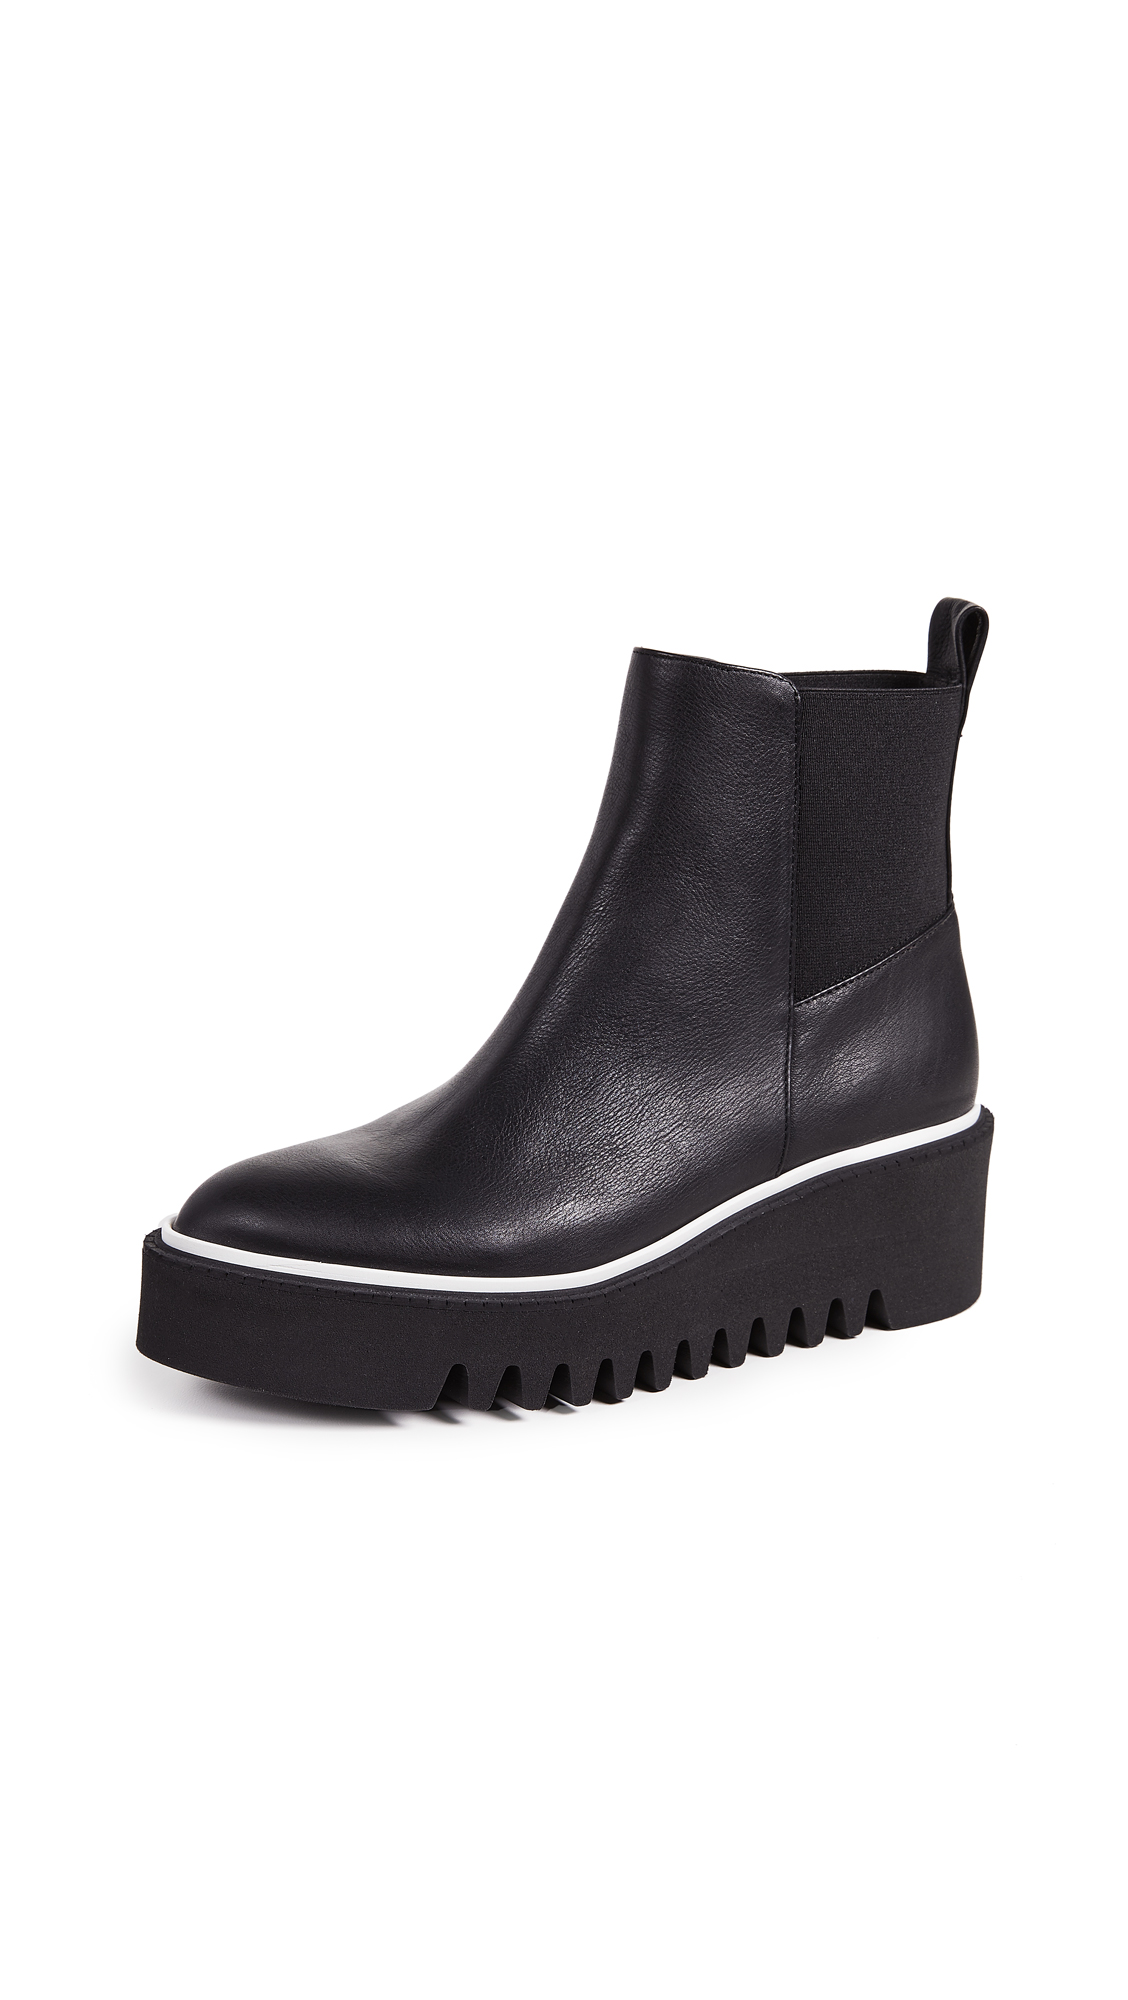 Paloma Barcelo Diamond Boots